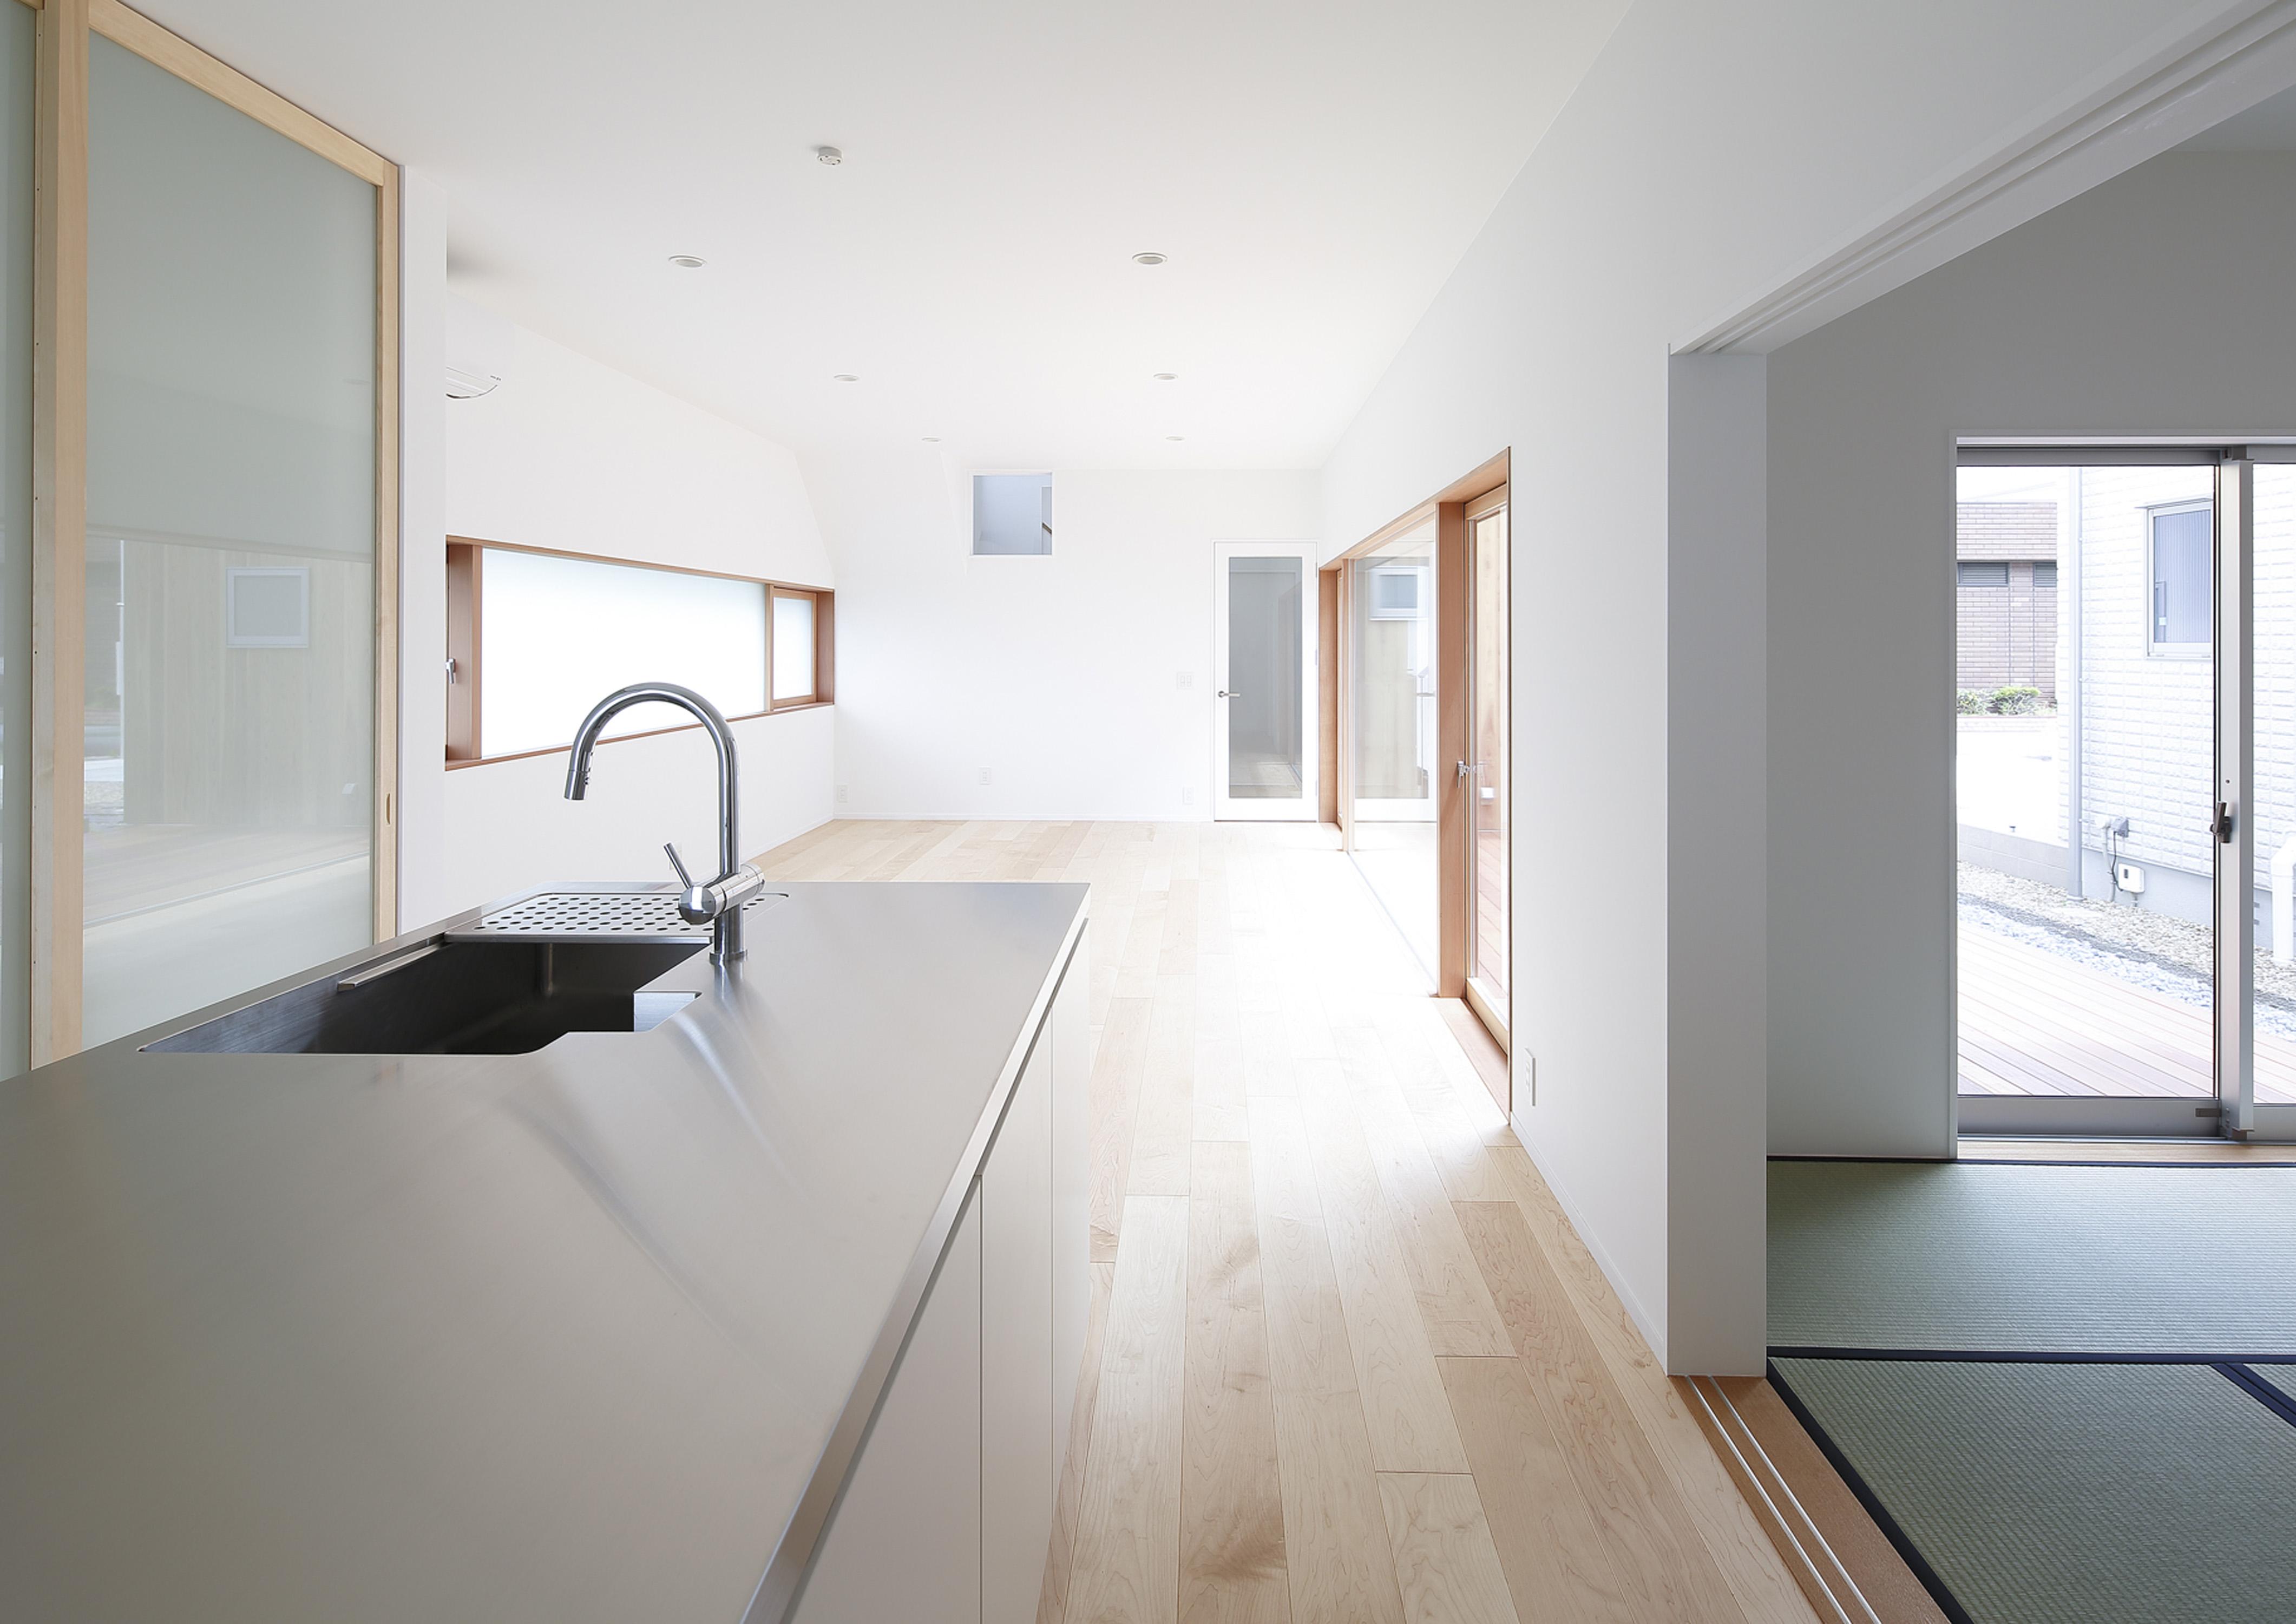 S邸(滋賀県彦根市)〈建築プロデュース〉